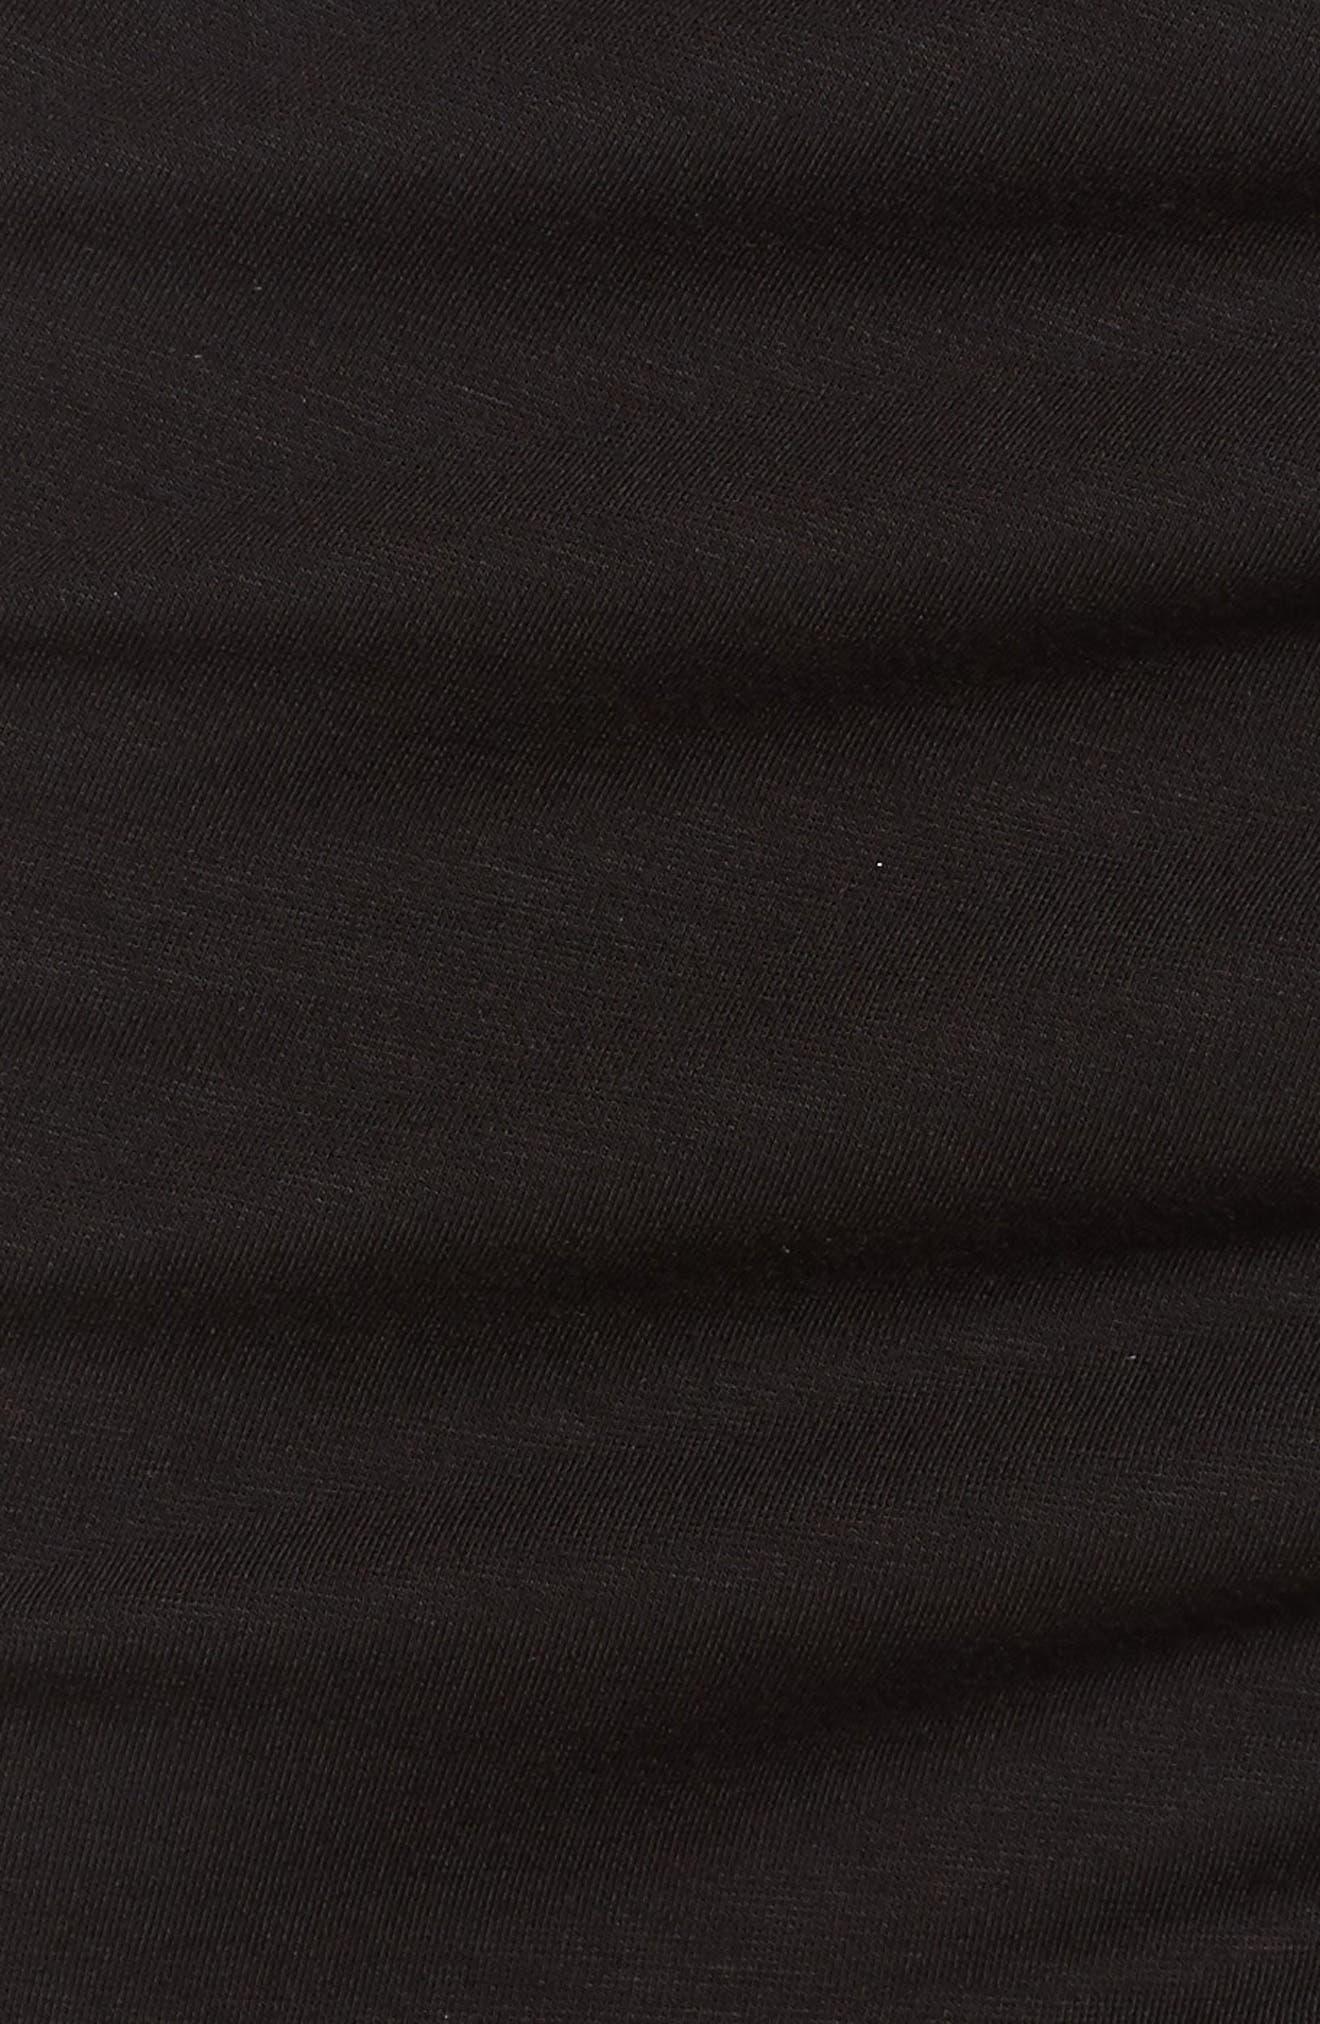 Side Ruffle Pencil Skirt,                             Alternate thumbnail 5, color,                             Black